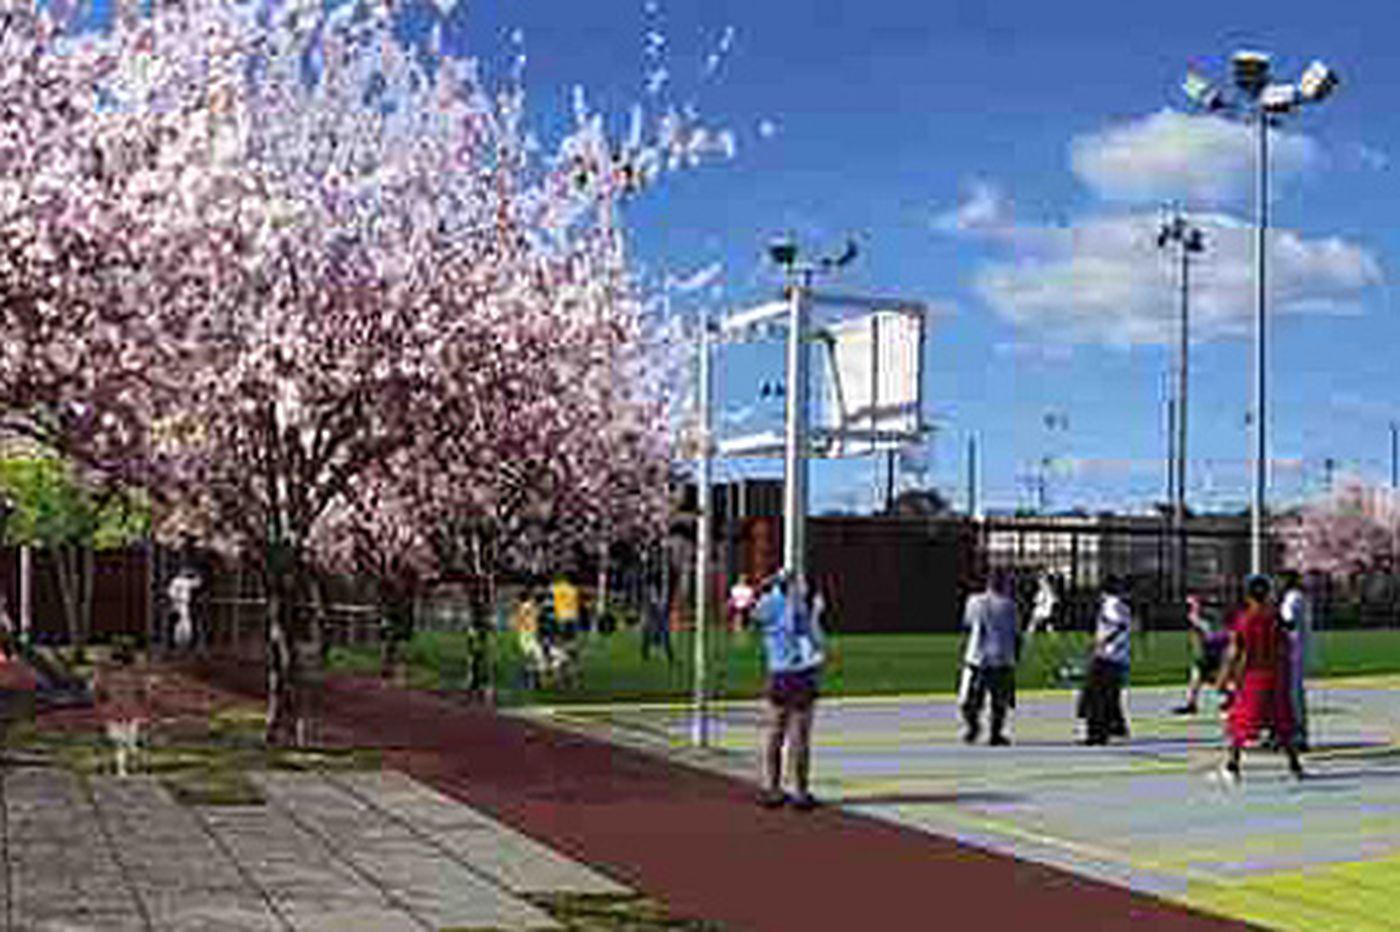 City plans proliferation of small parks